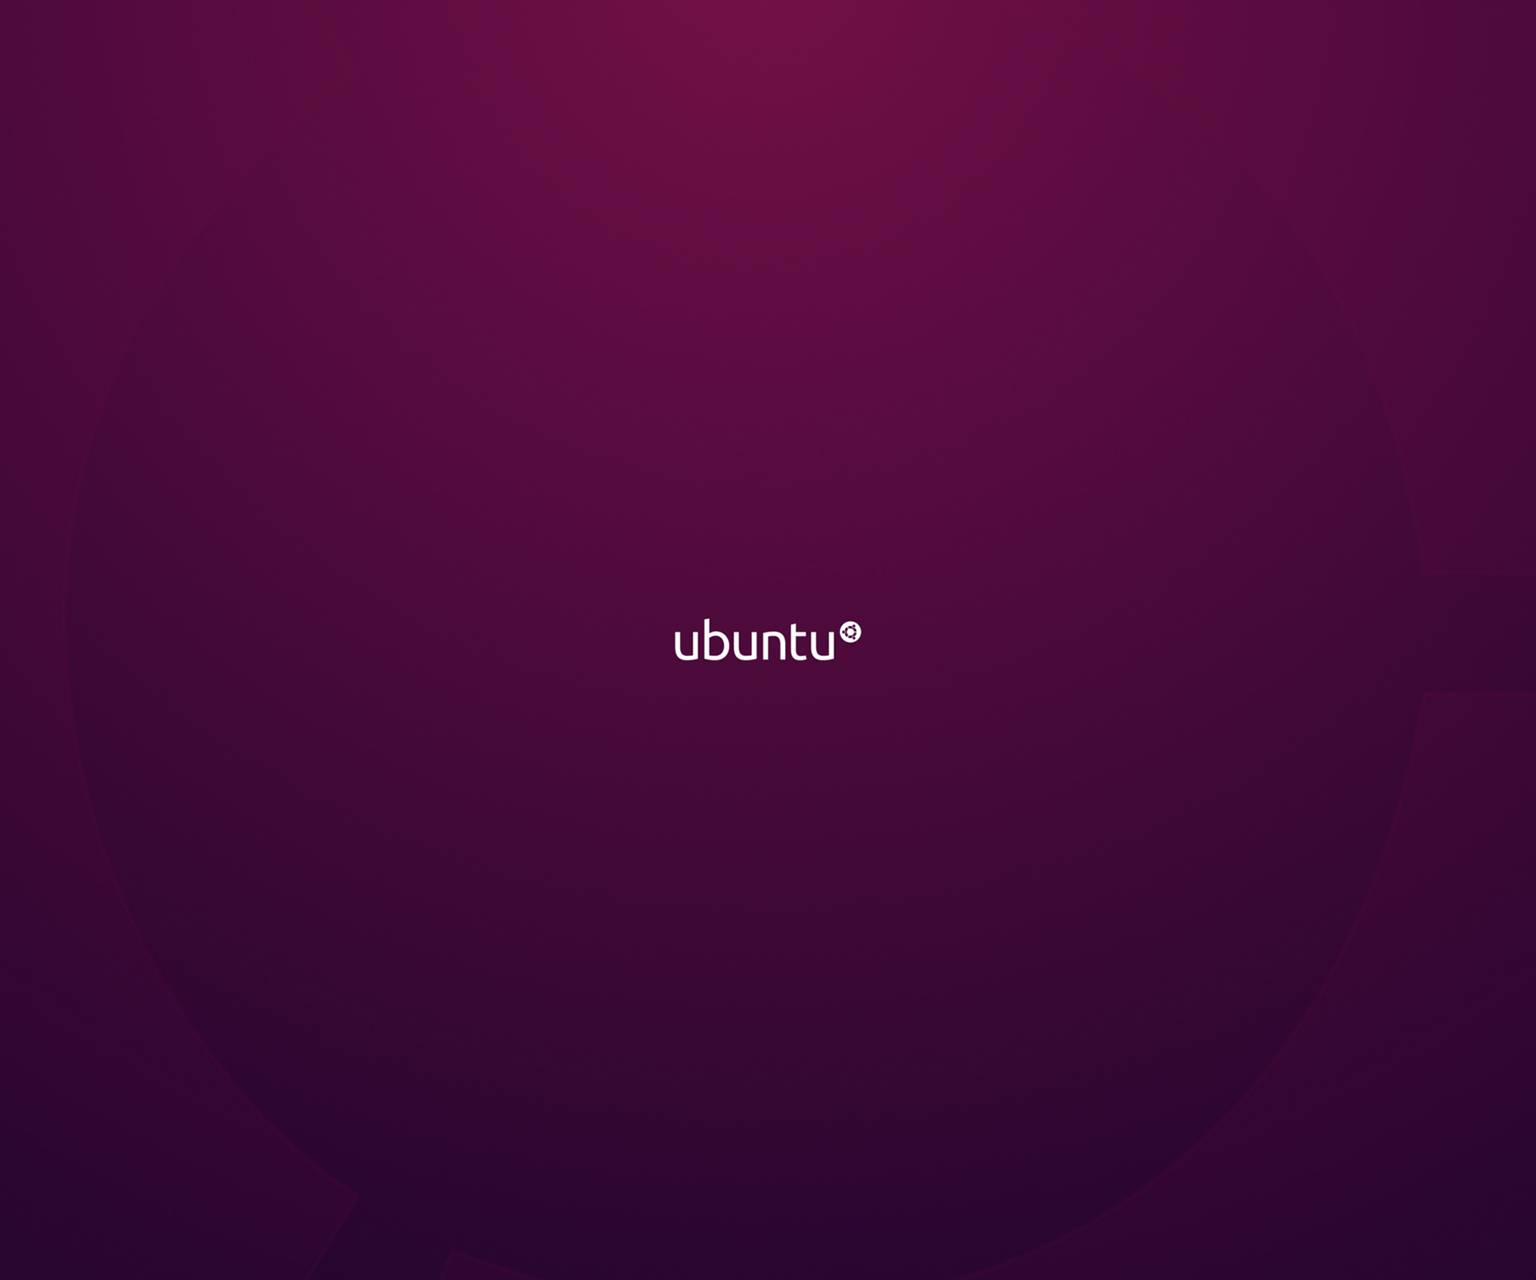 Ubuntu Purple